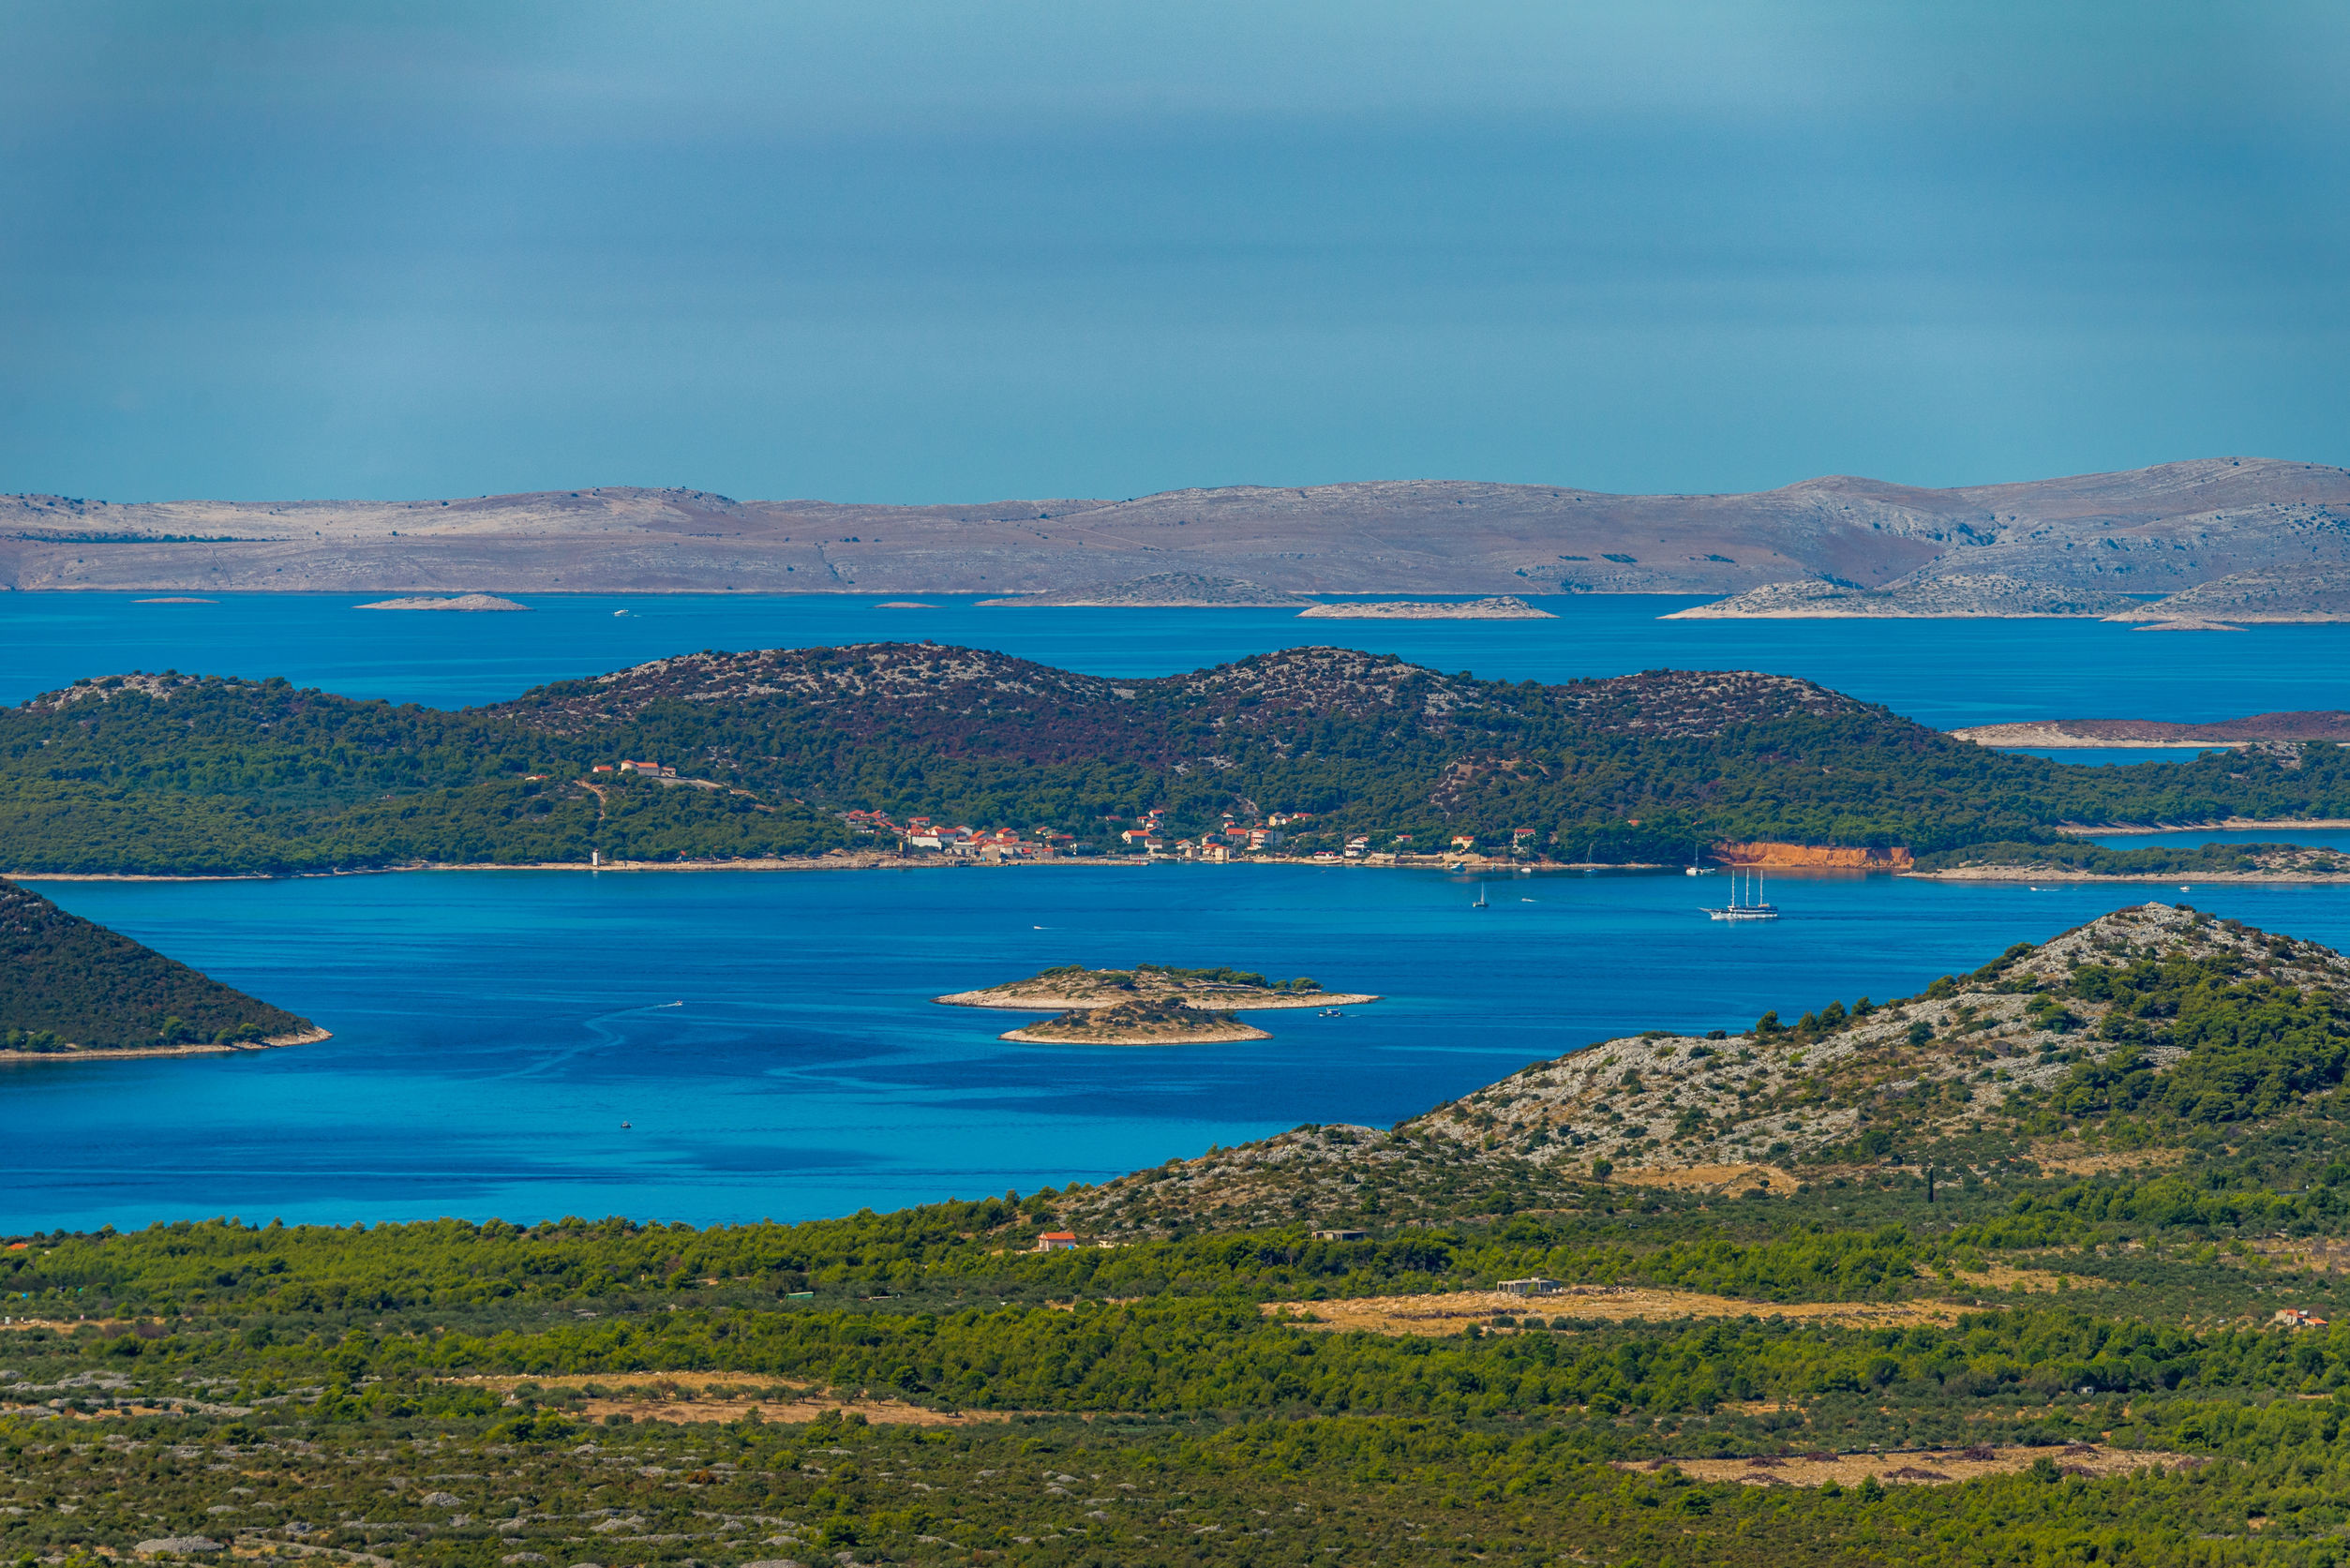 Vransko Lake and Kornati Islands. View from Kamenjak hill. Dalma